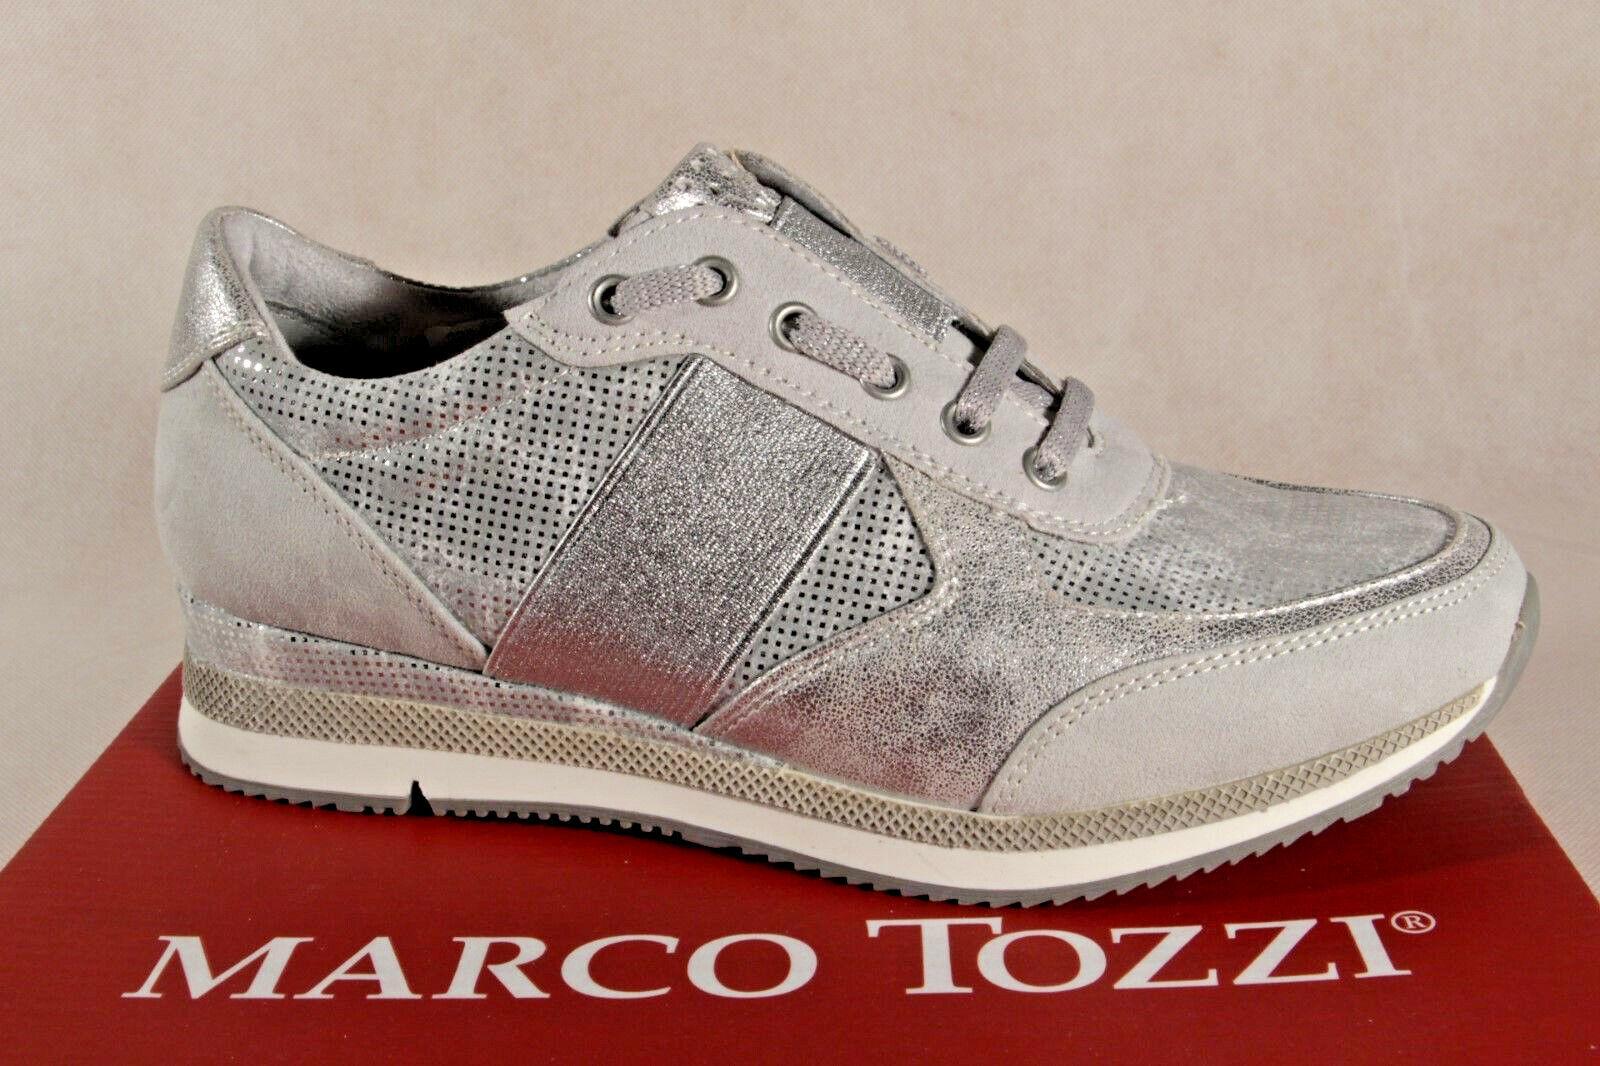 Marco Tozzi Pantofola Scarpe da Ginnastica Basse argentoo 23711 Nuovo